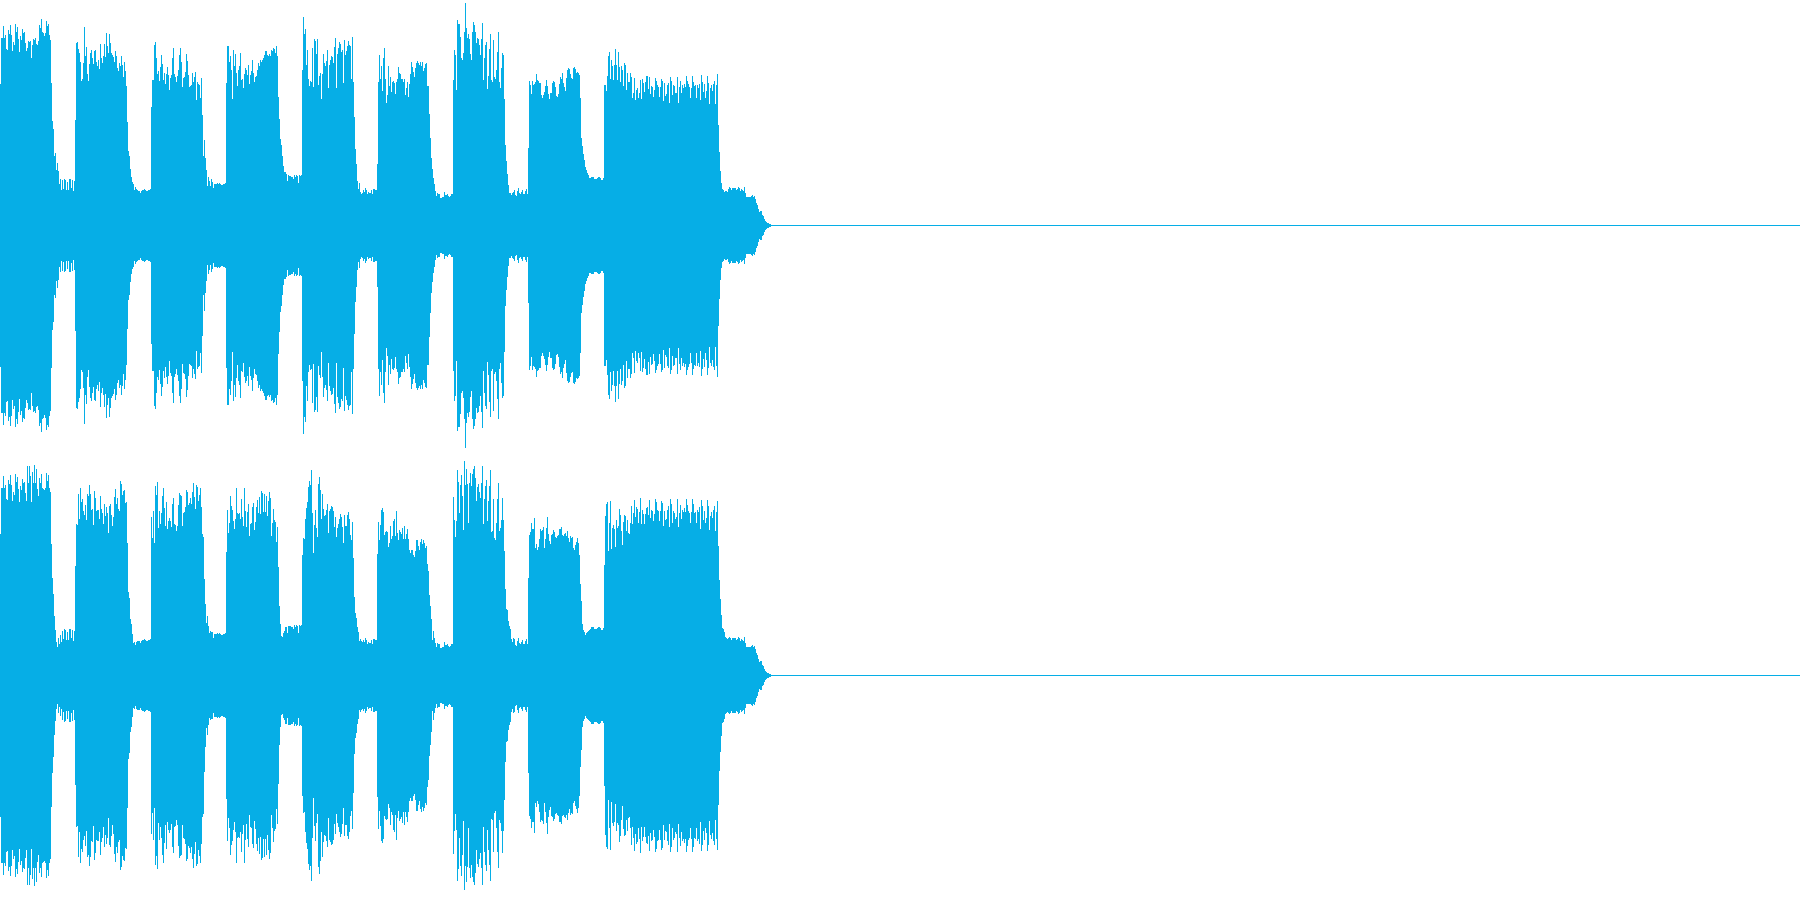 RetroGame 巨大化効果音の再生済みの波形